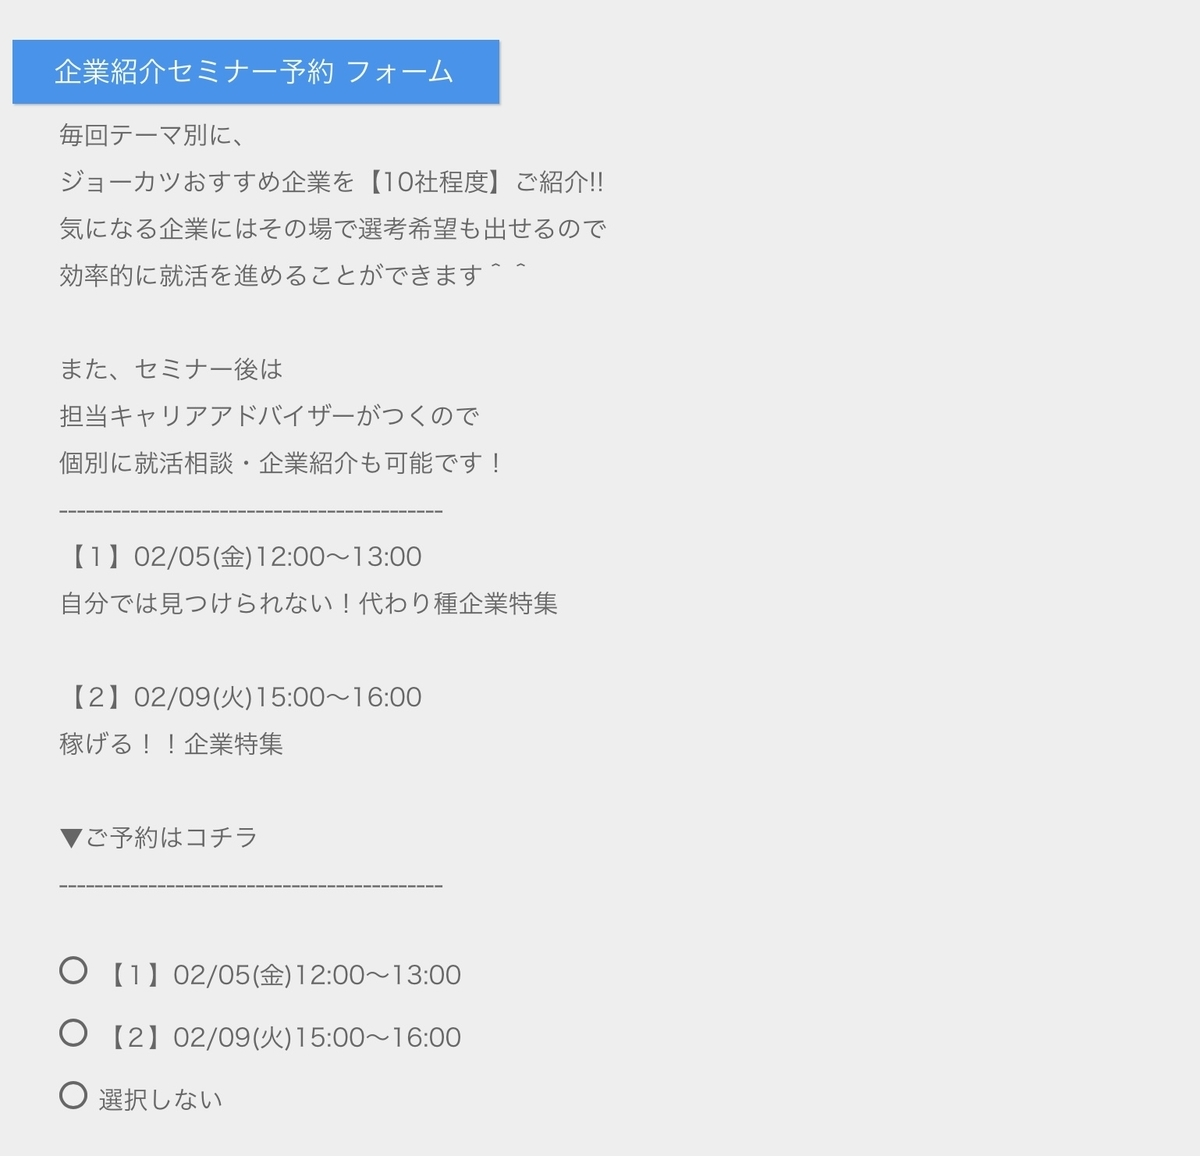 f:id:aibolic:20210207220749j:plain